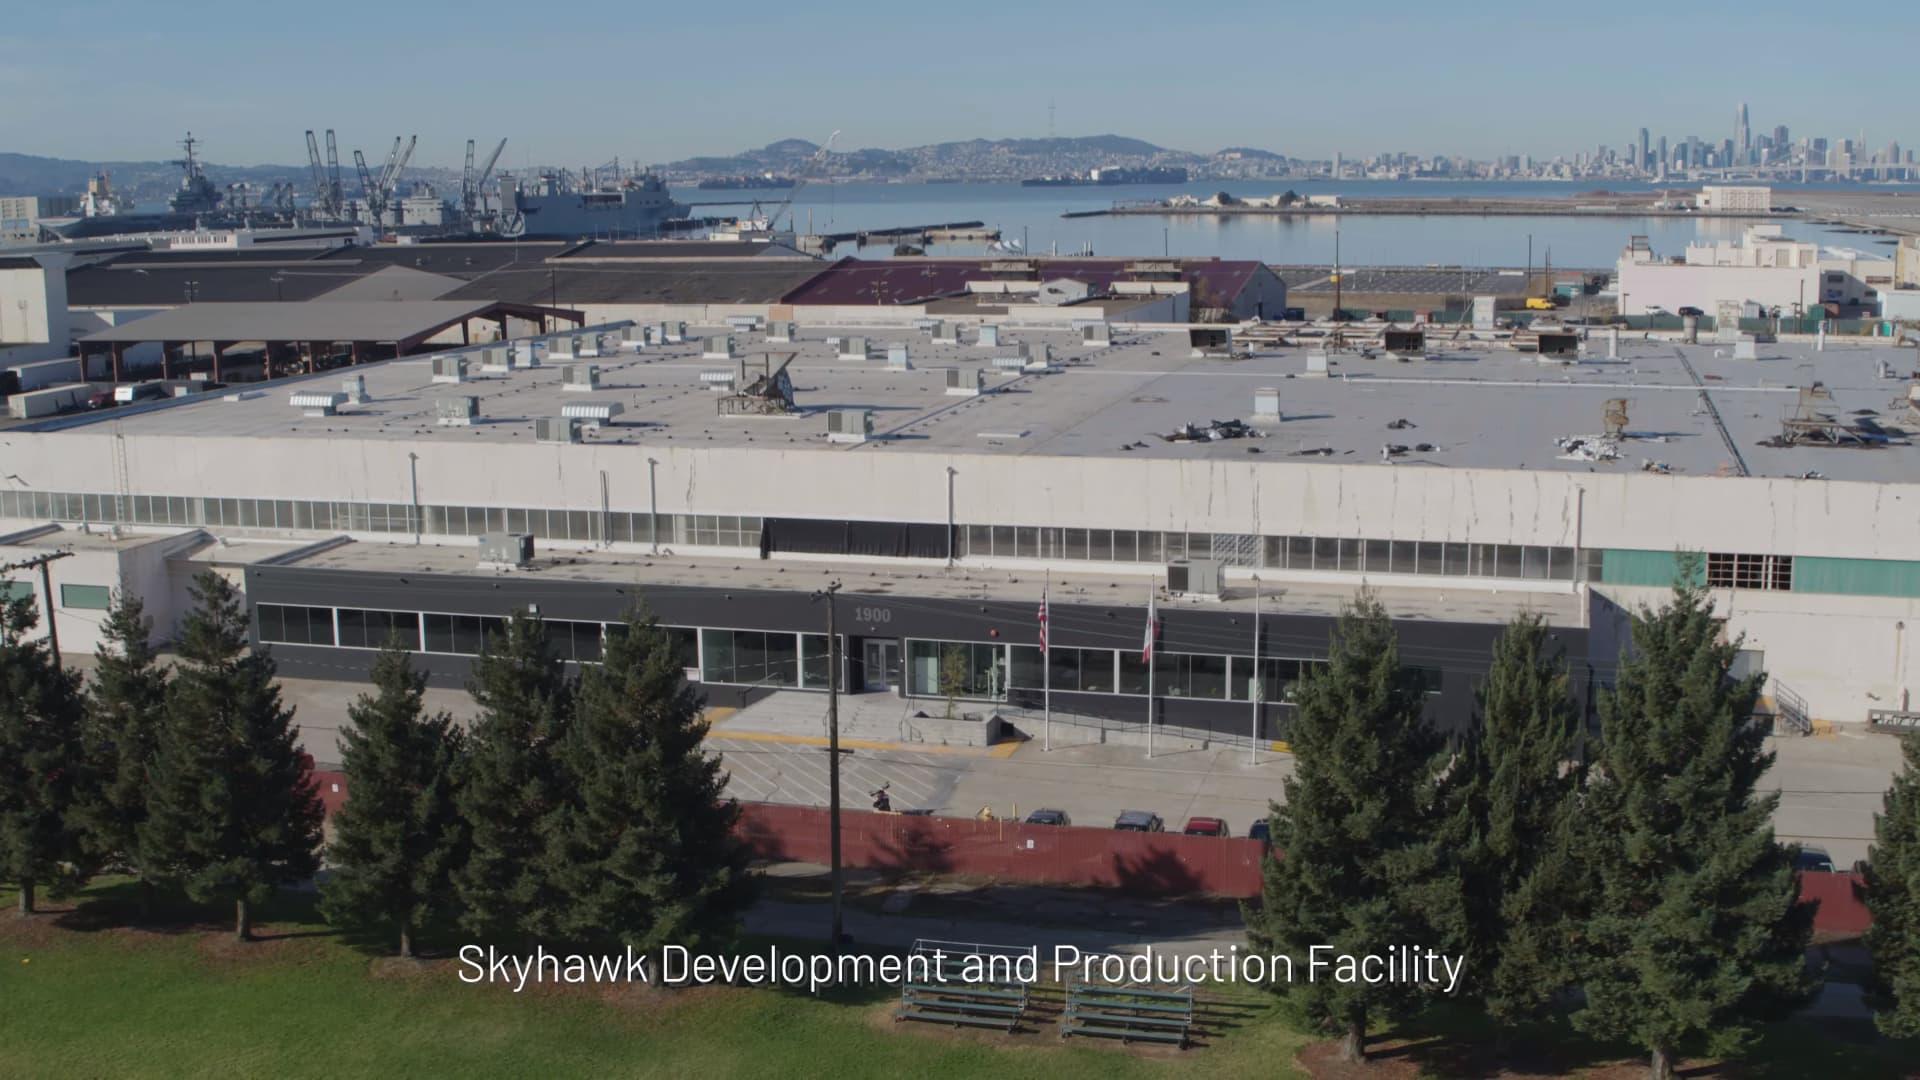 The company's headquarters near the San Francisco Bay in California.